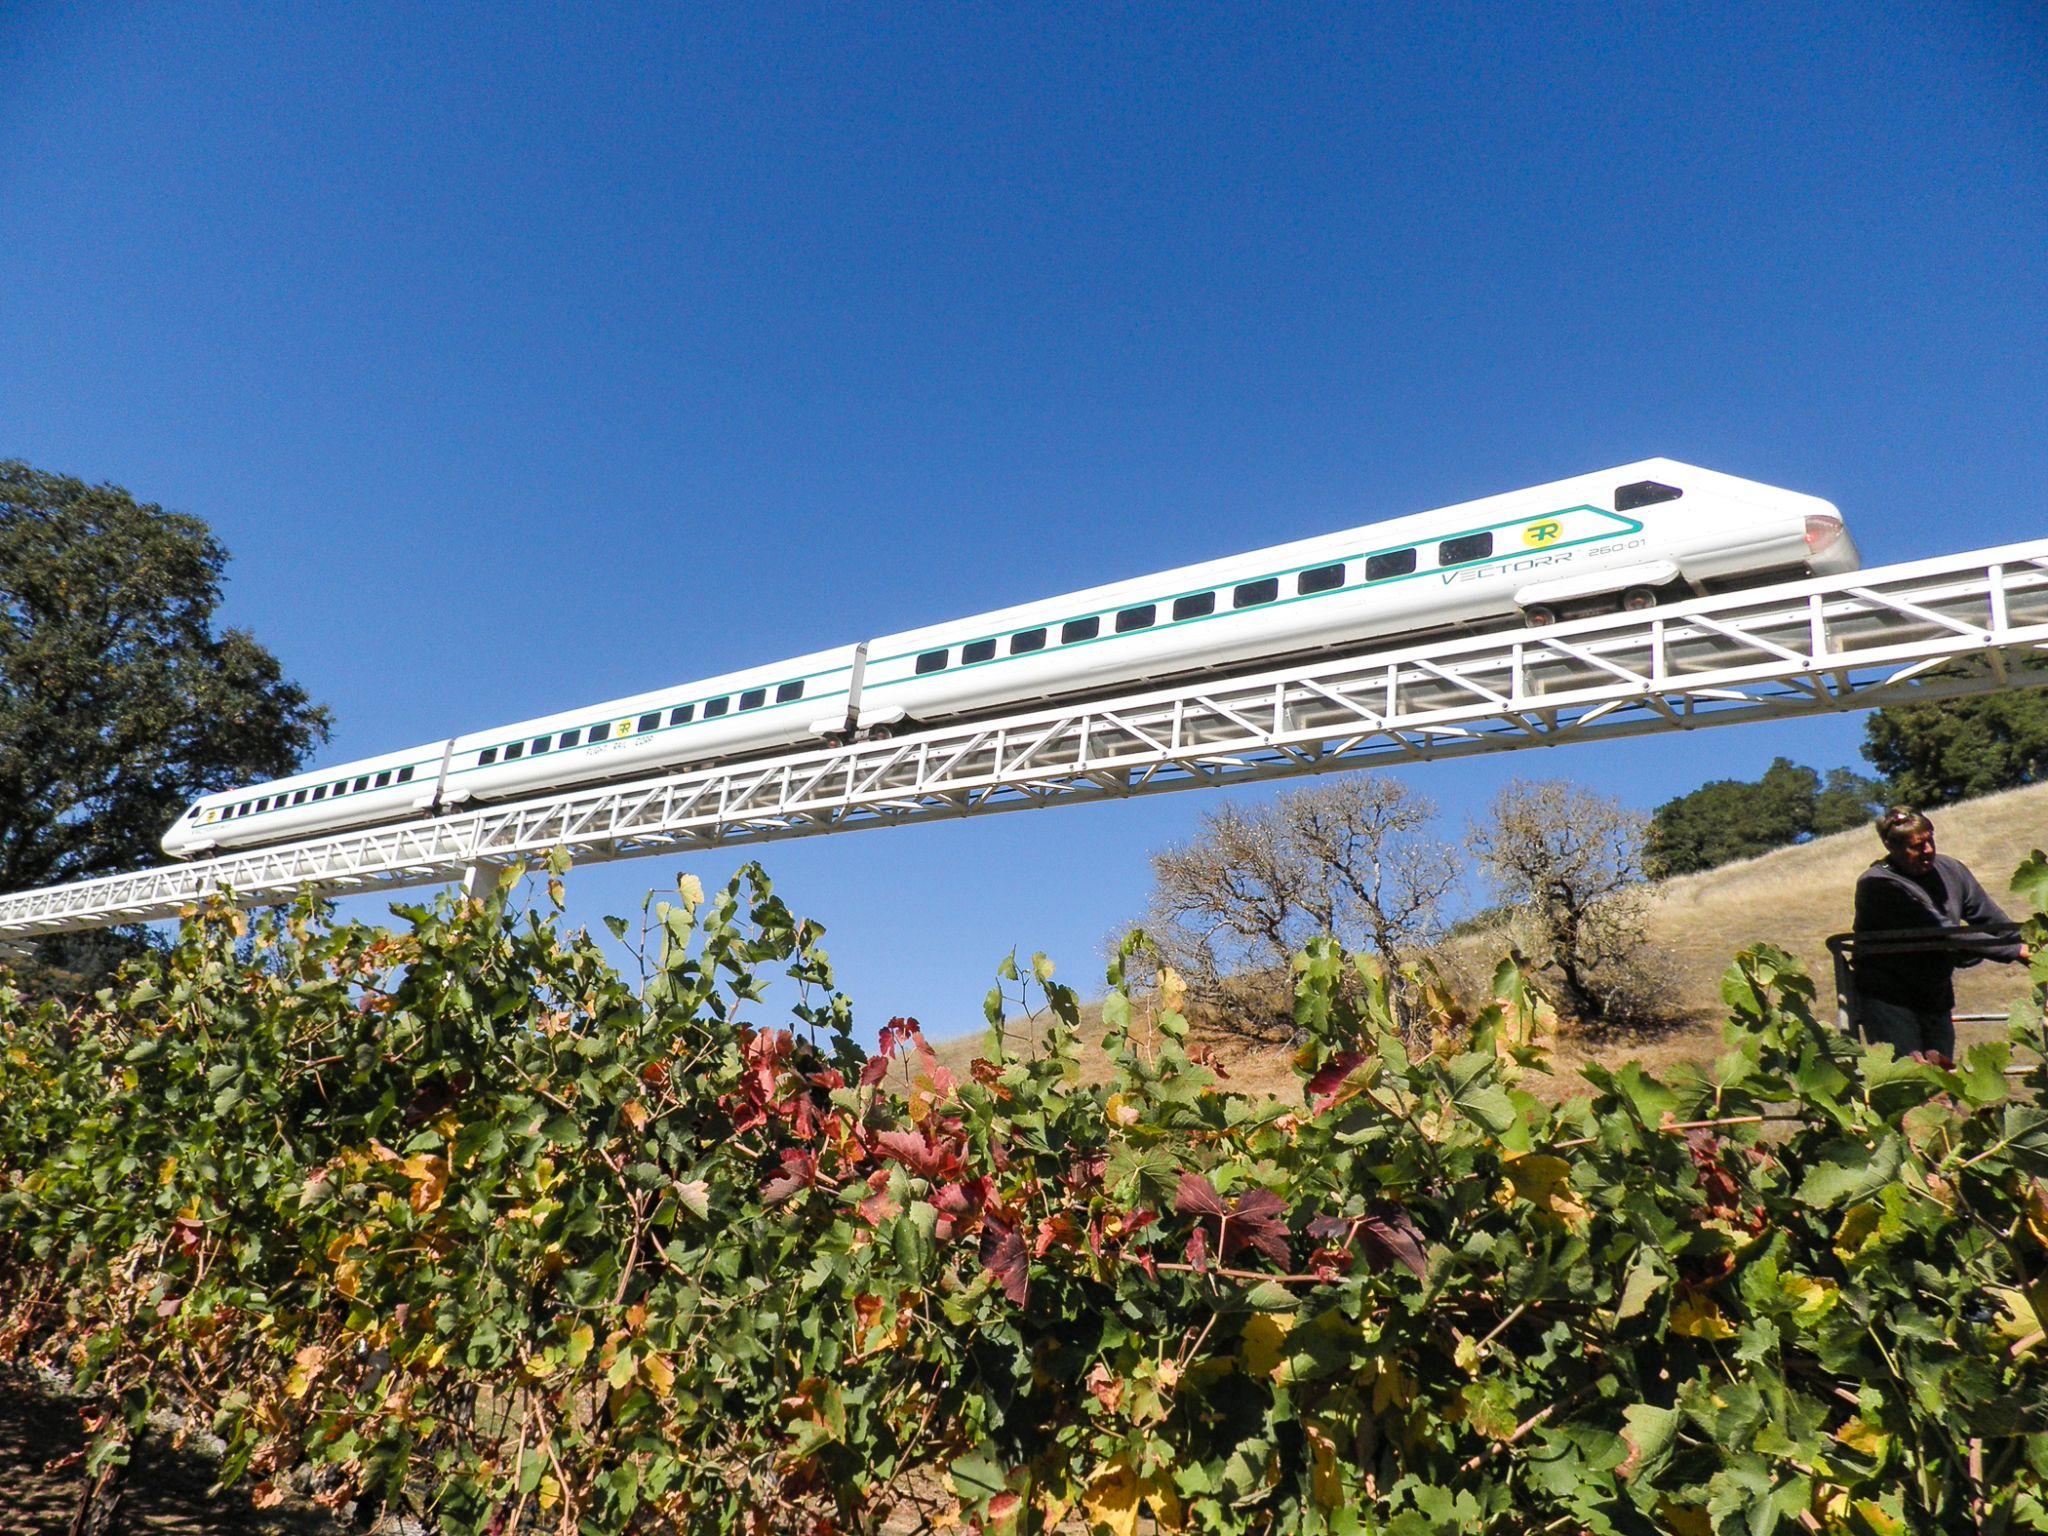 89 year old ukiah man builds hyperloop competitor in backyard sfgate